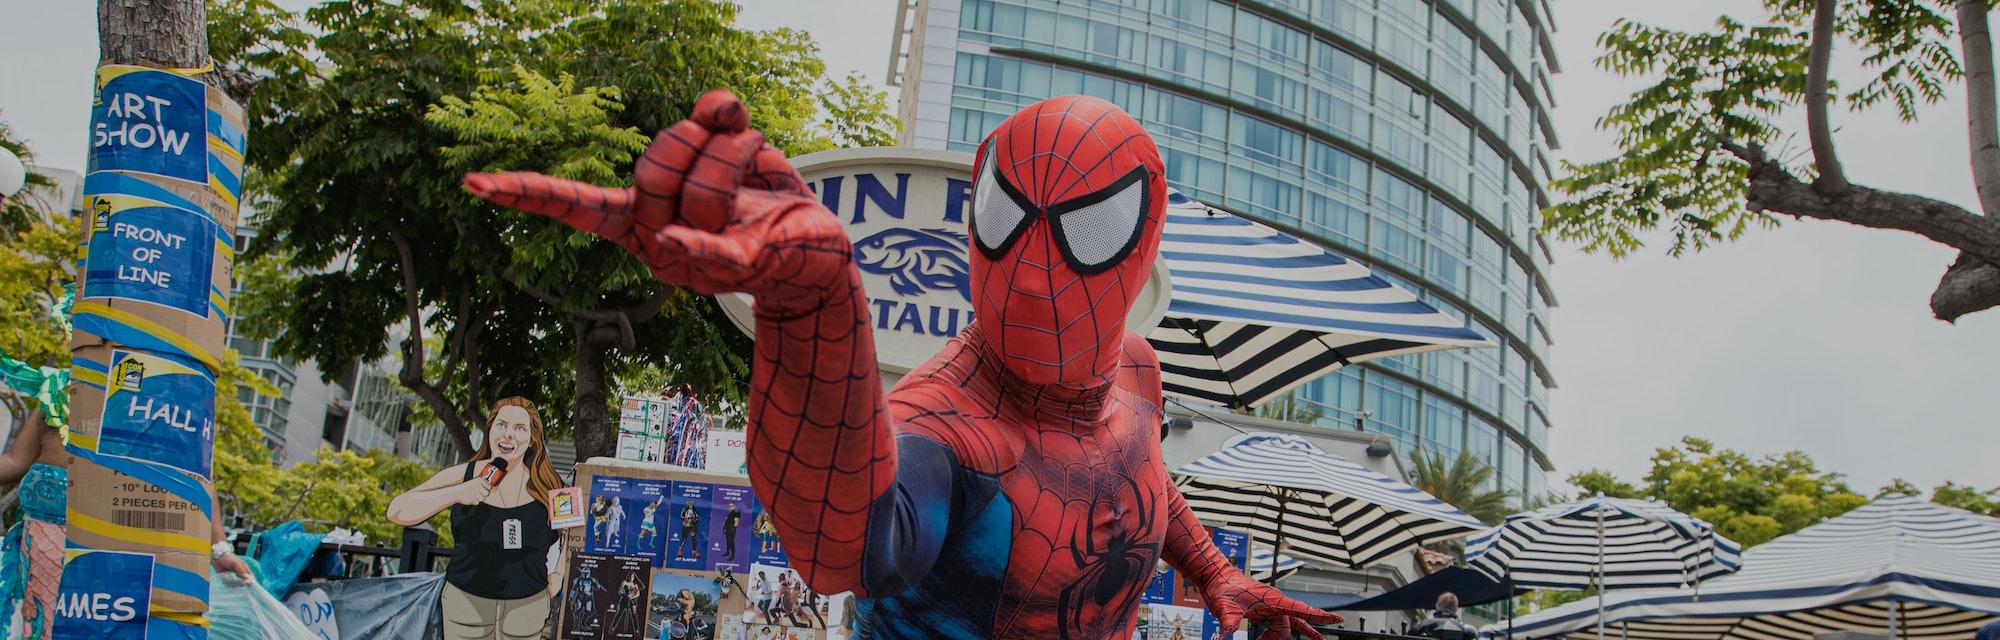 SAN DIEGO, CALIFORNIA - JULY 24: Cosplayer Derek Shackelton as Spiderman poses at the San Diego Caus...